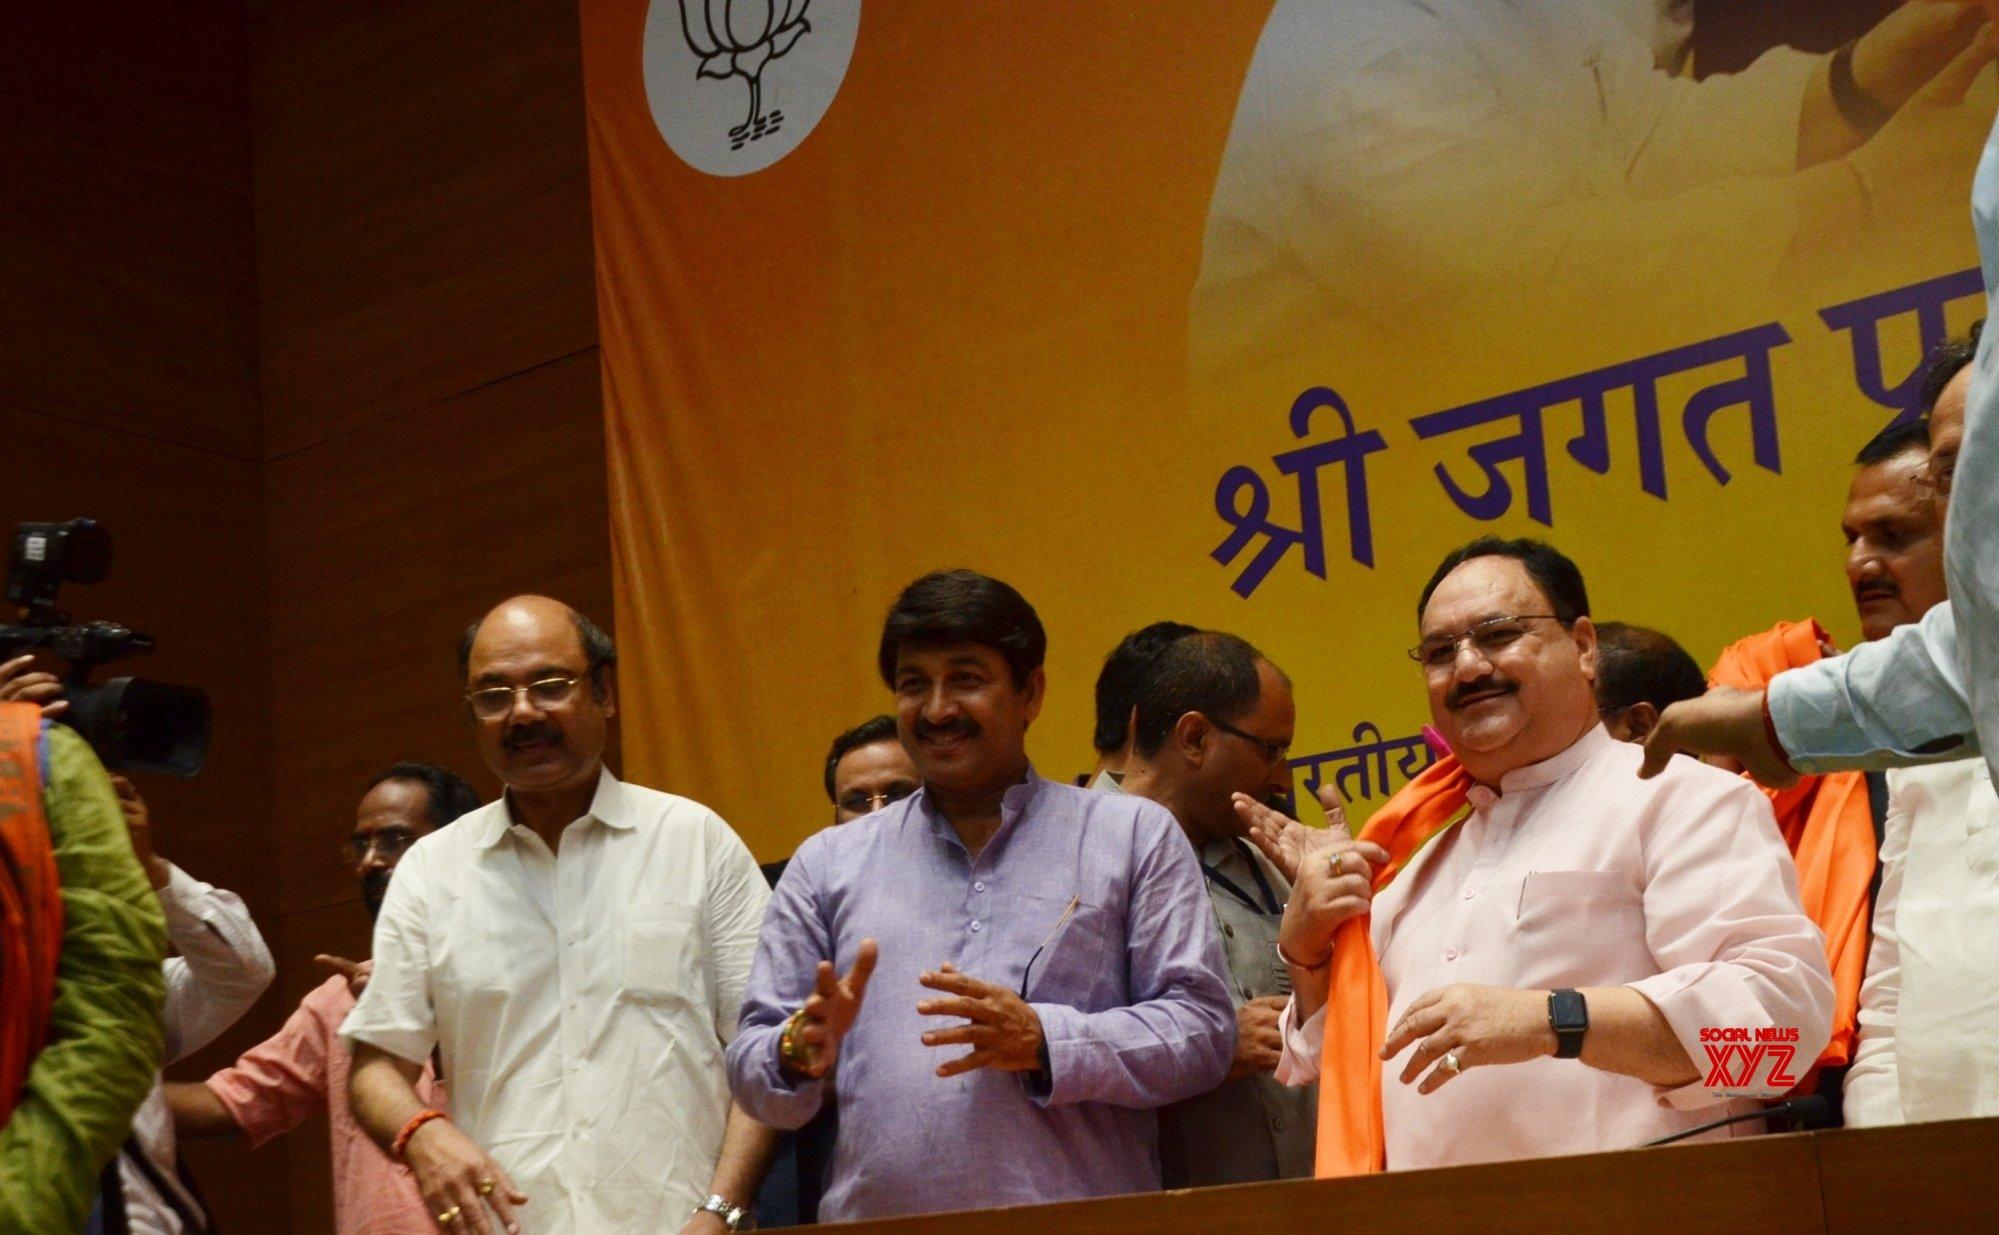 New Delhi: J.P. Nadda's felicitation programme #Gallery